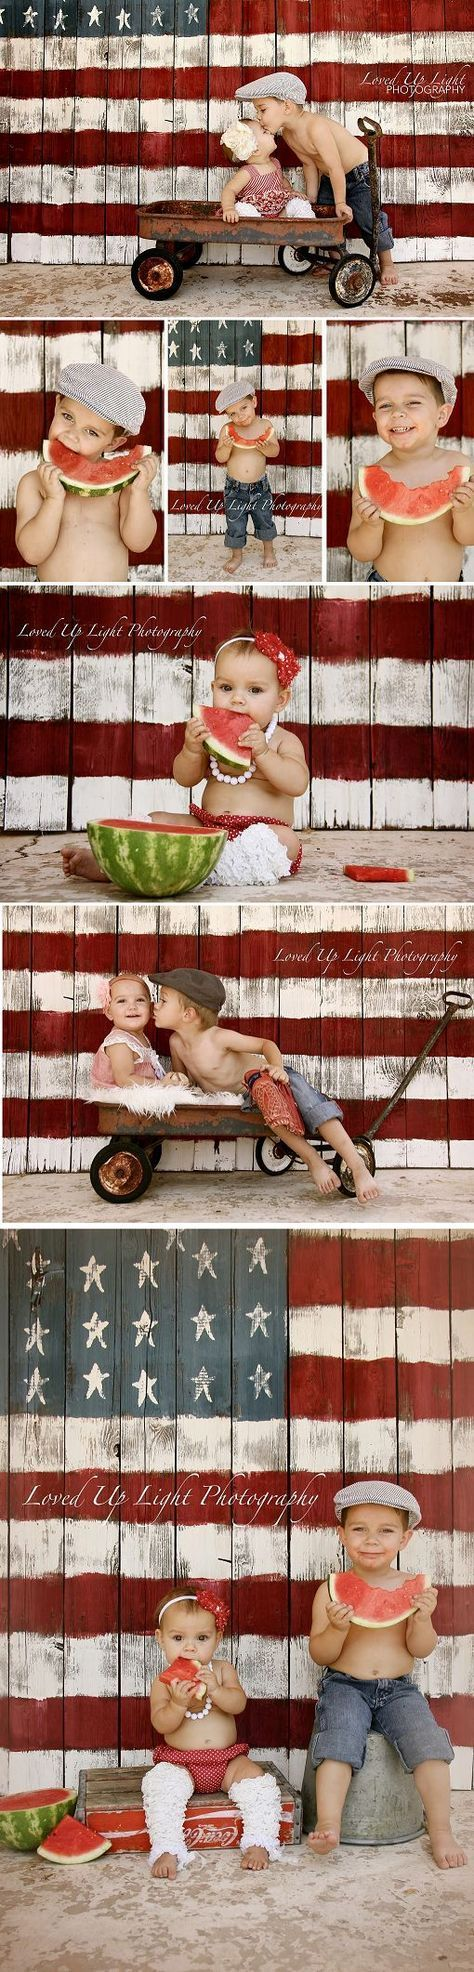 4. Juli Mini-Shooting Loved Up Light Fotografie: {Kids} Liebe diesen Backdrop! ….., # 4. # 4 …   – BABY PICTURES